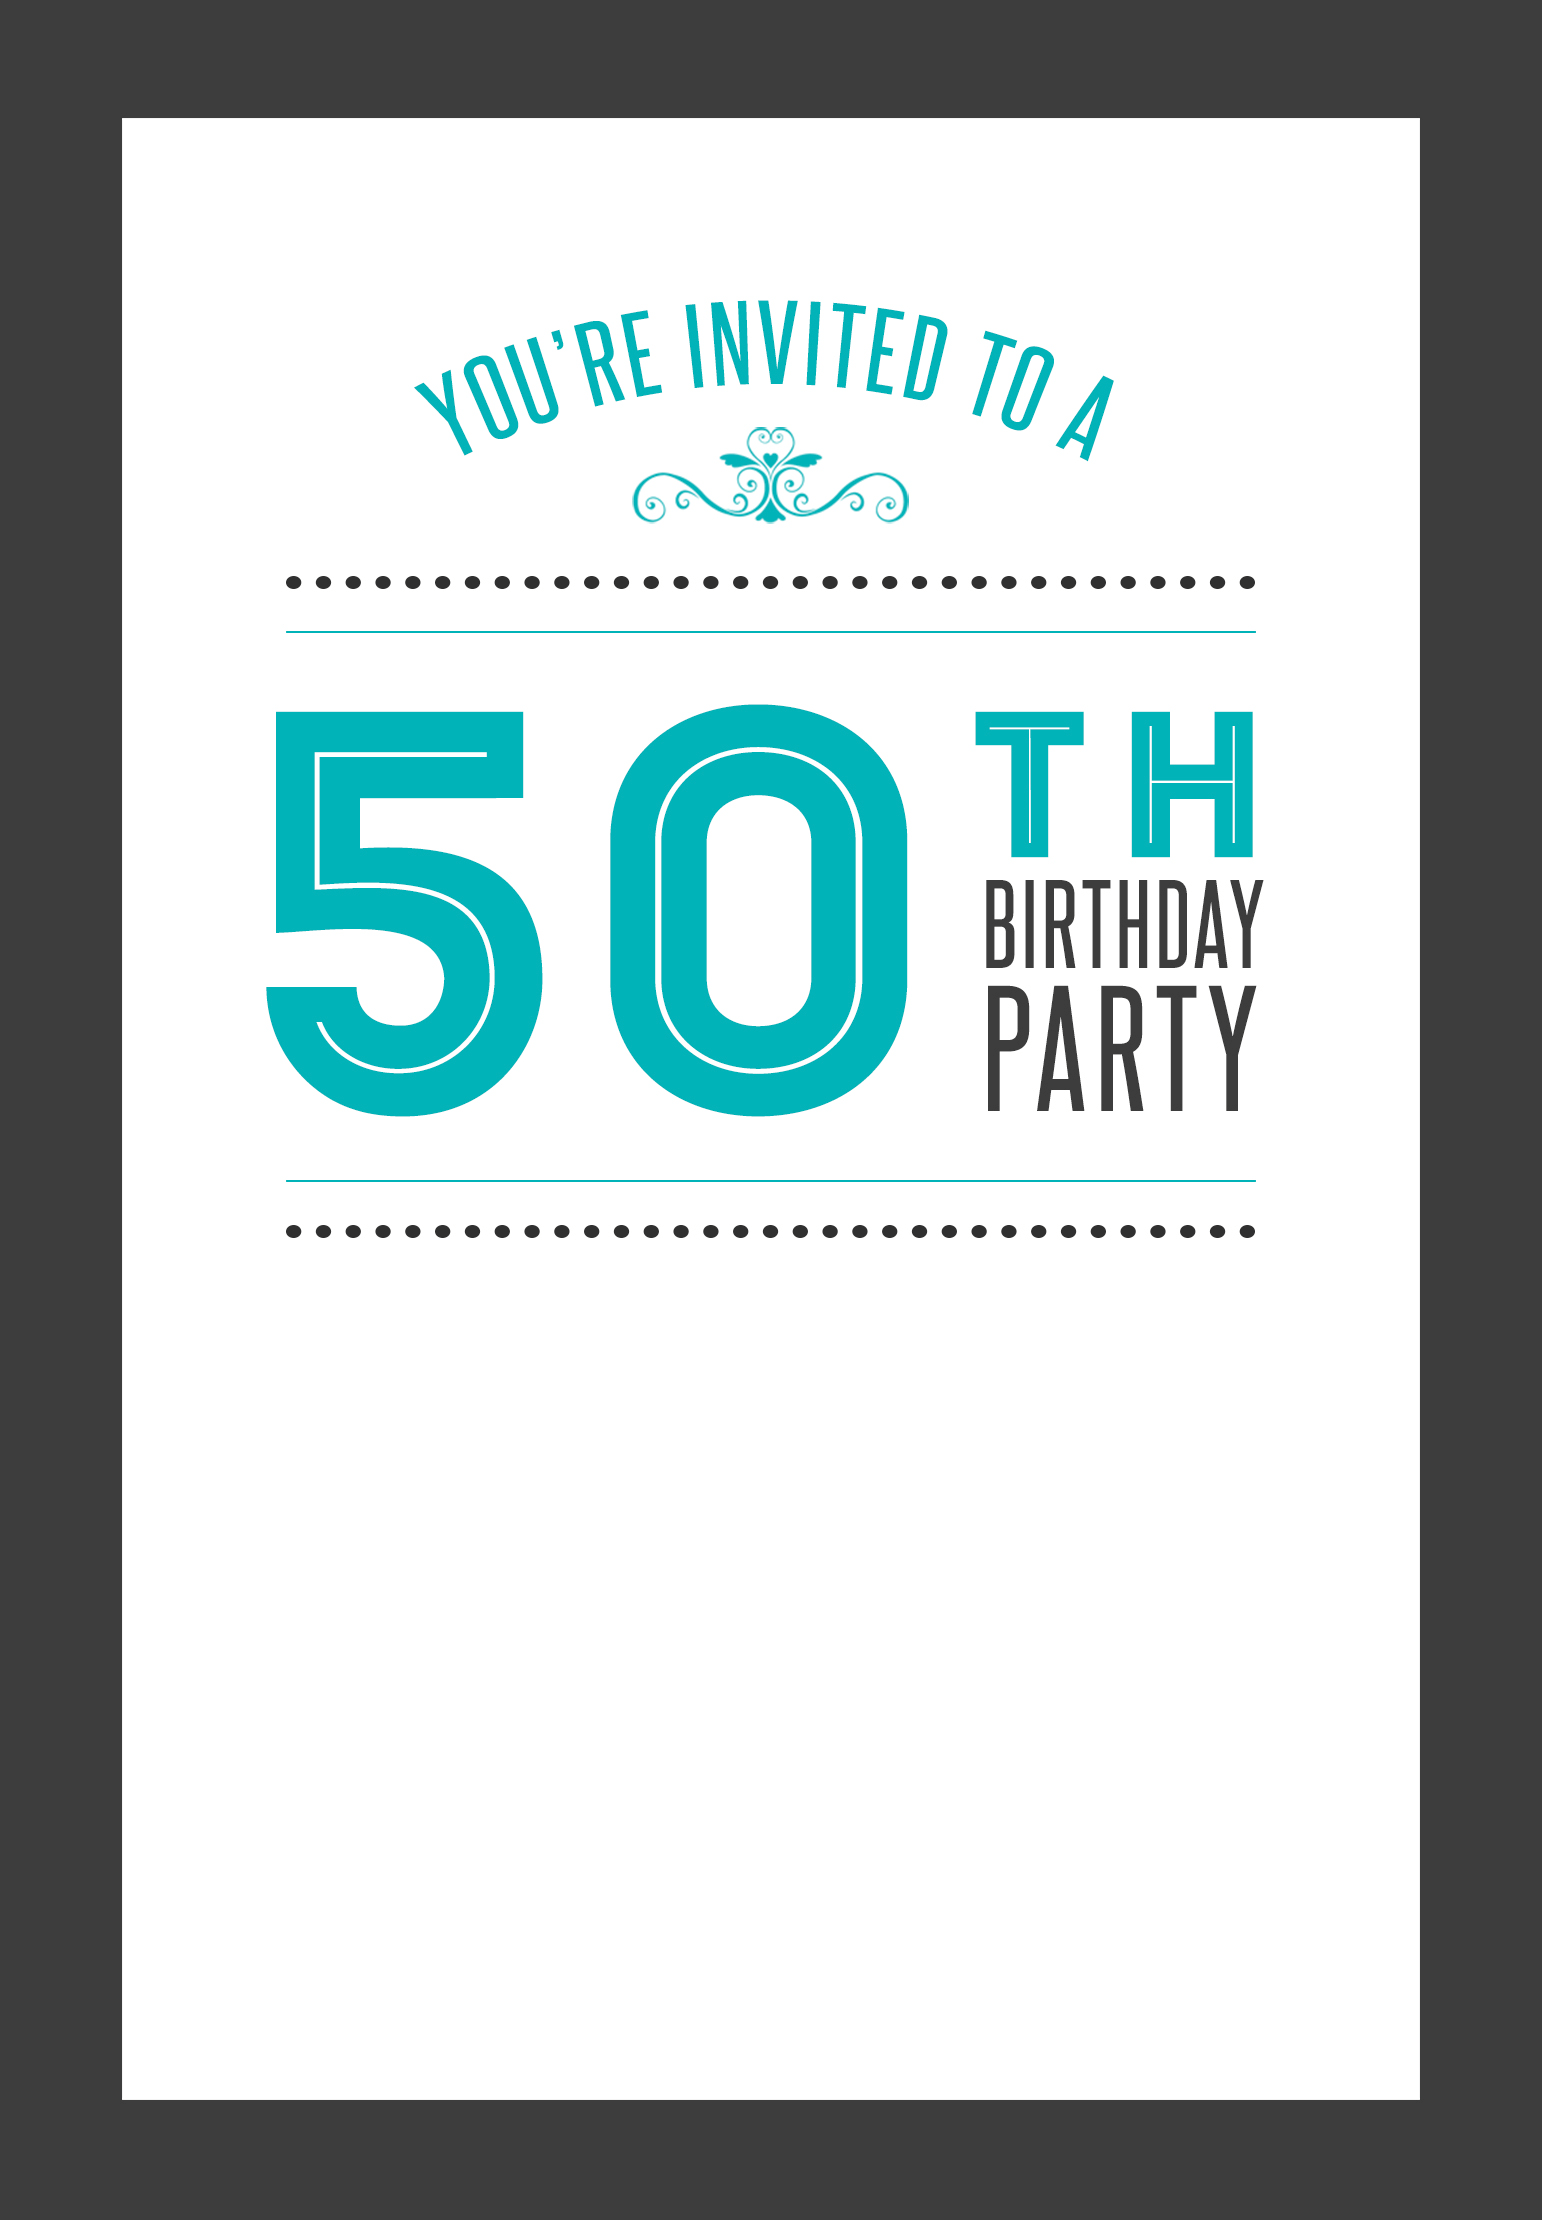 99 50th birthday invites